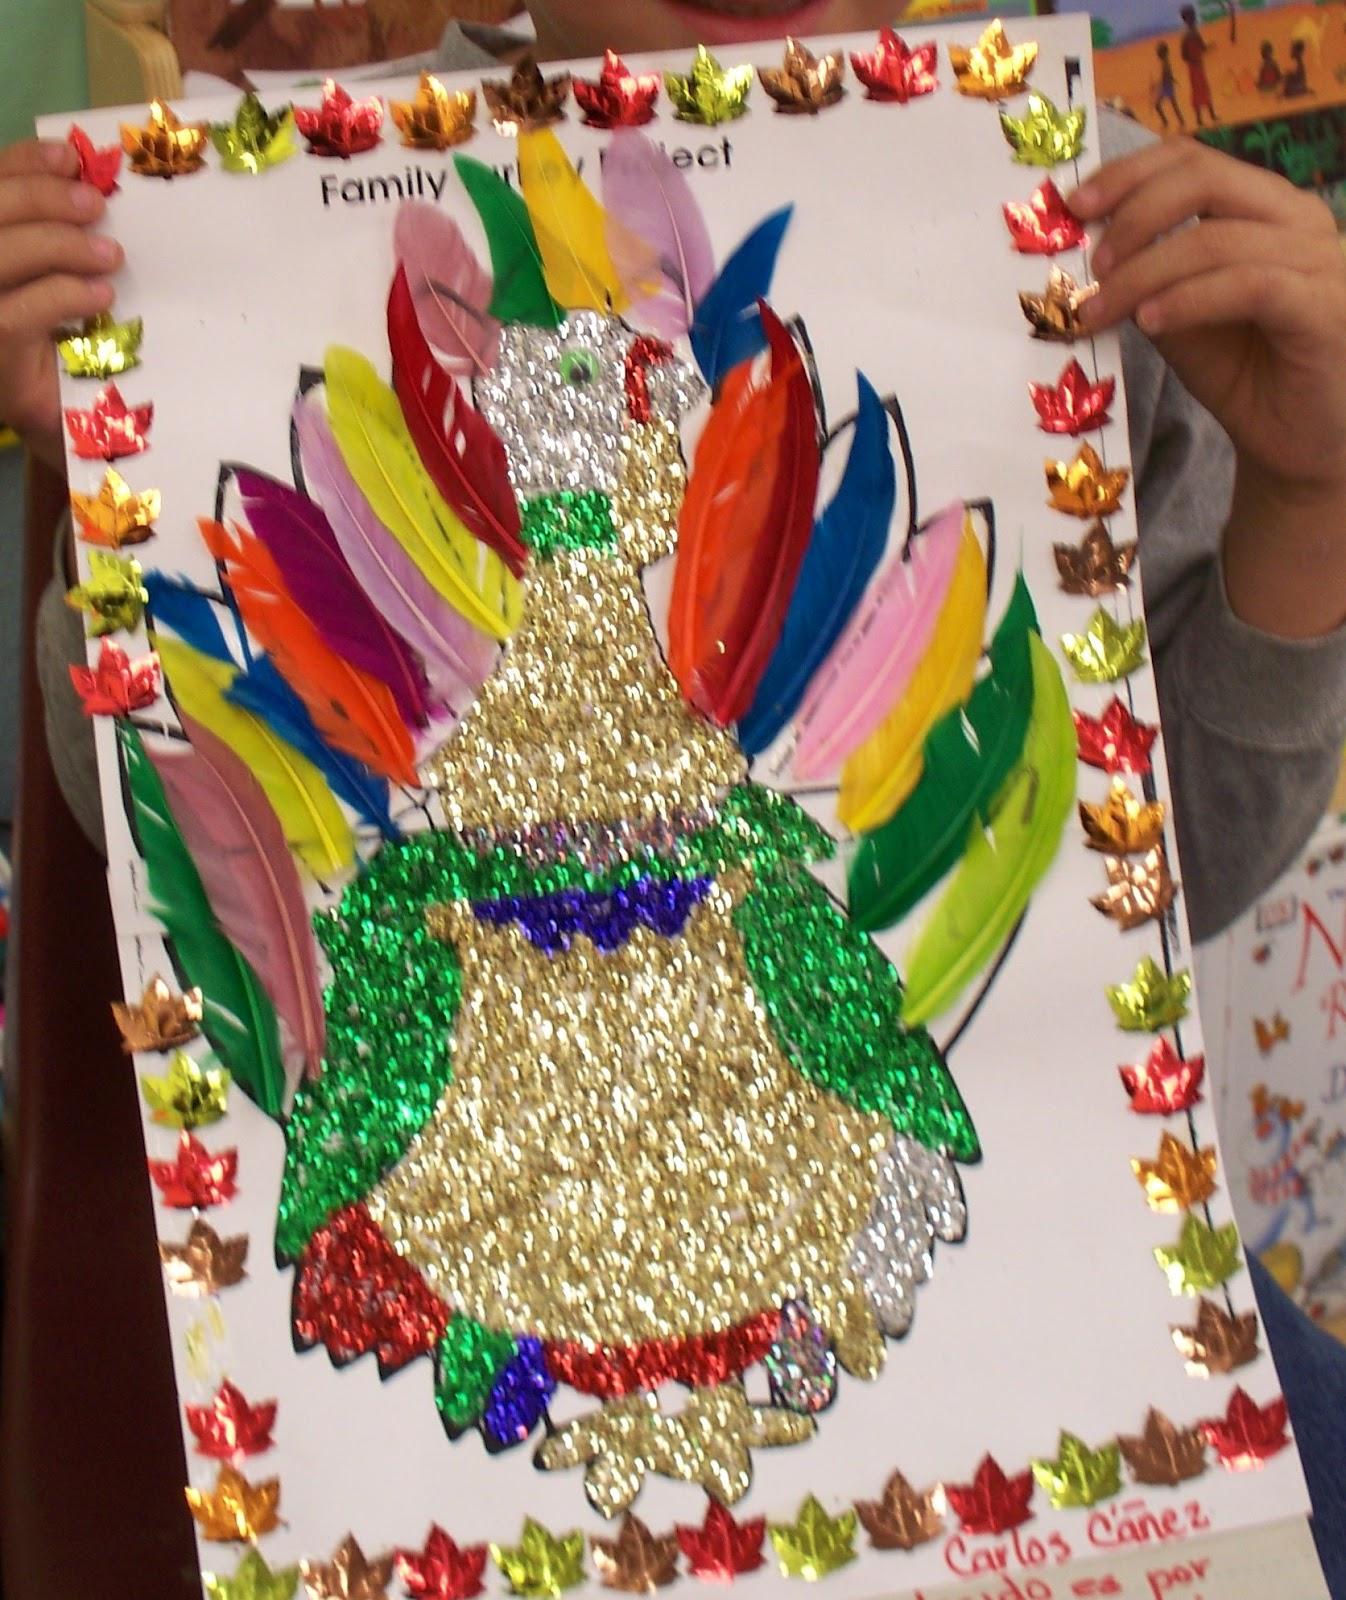 I heart my kinder kids family turkey project family turkey project maxwellsz